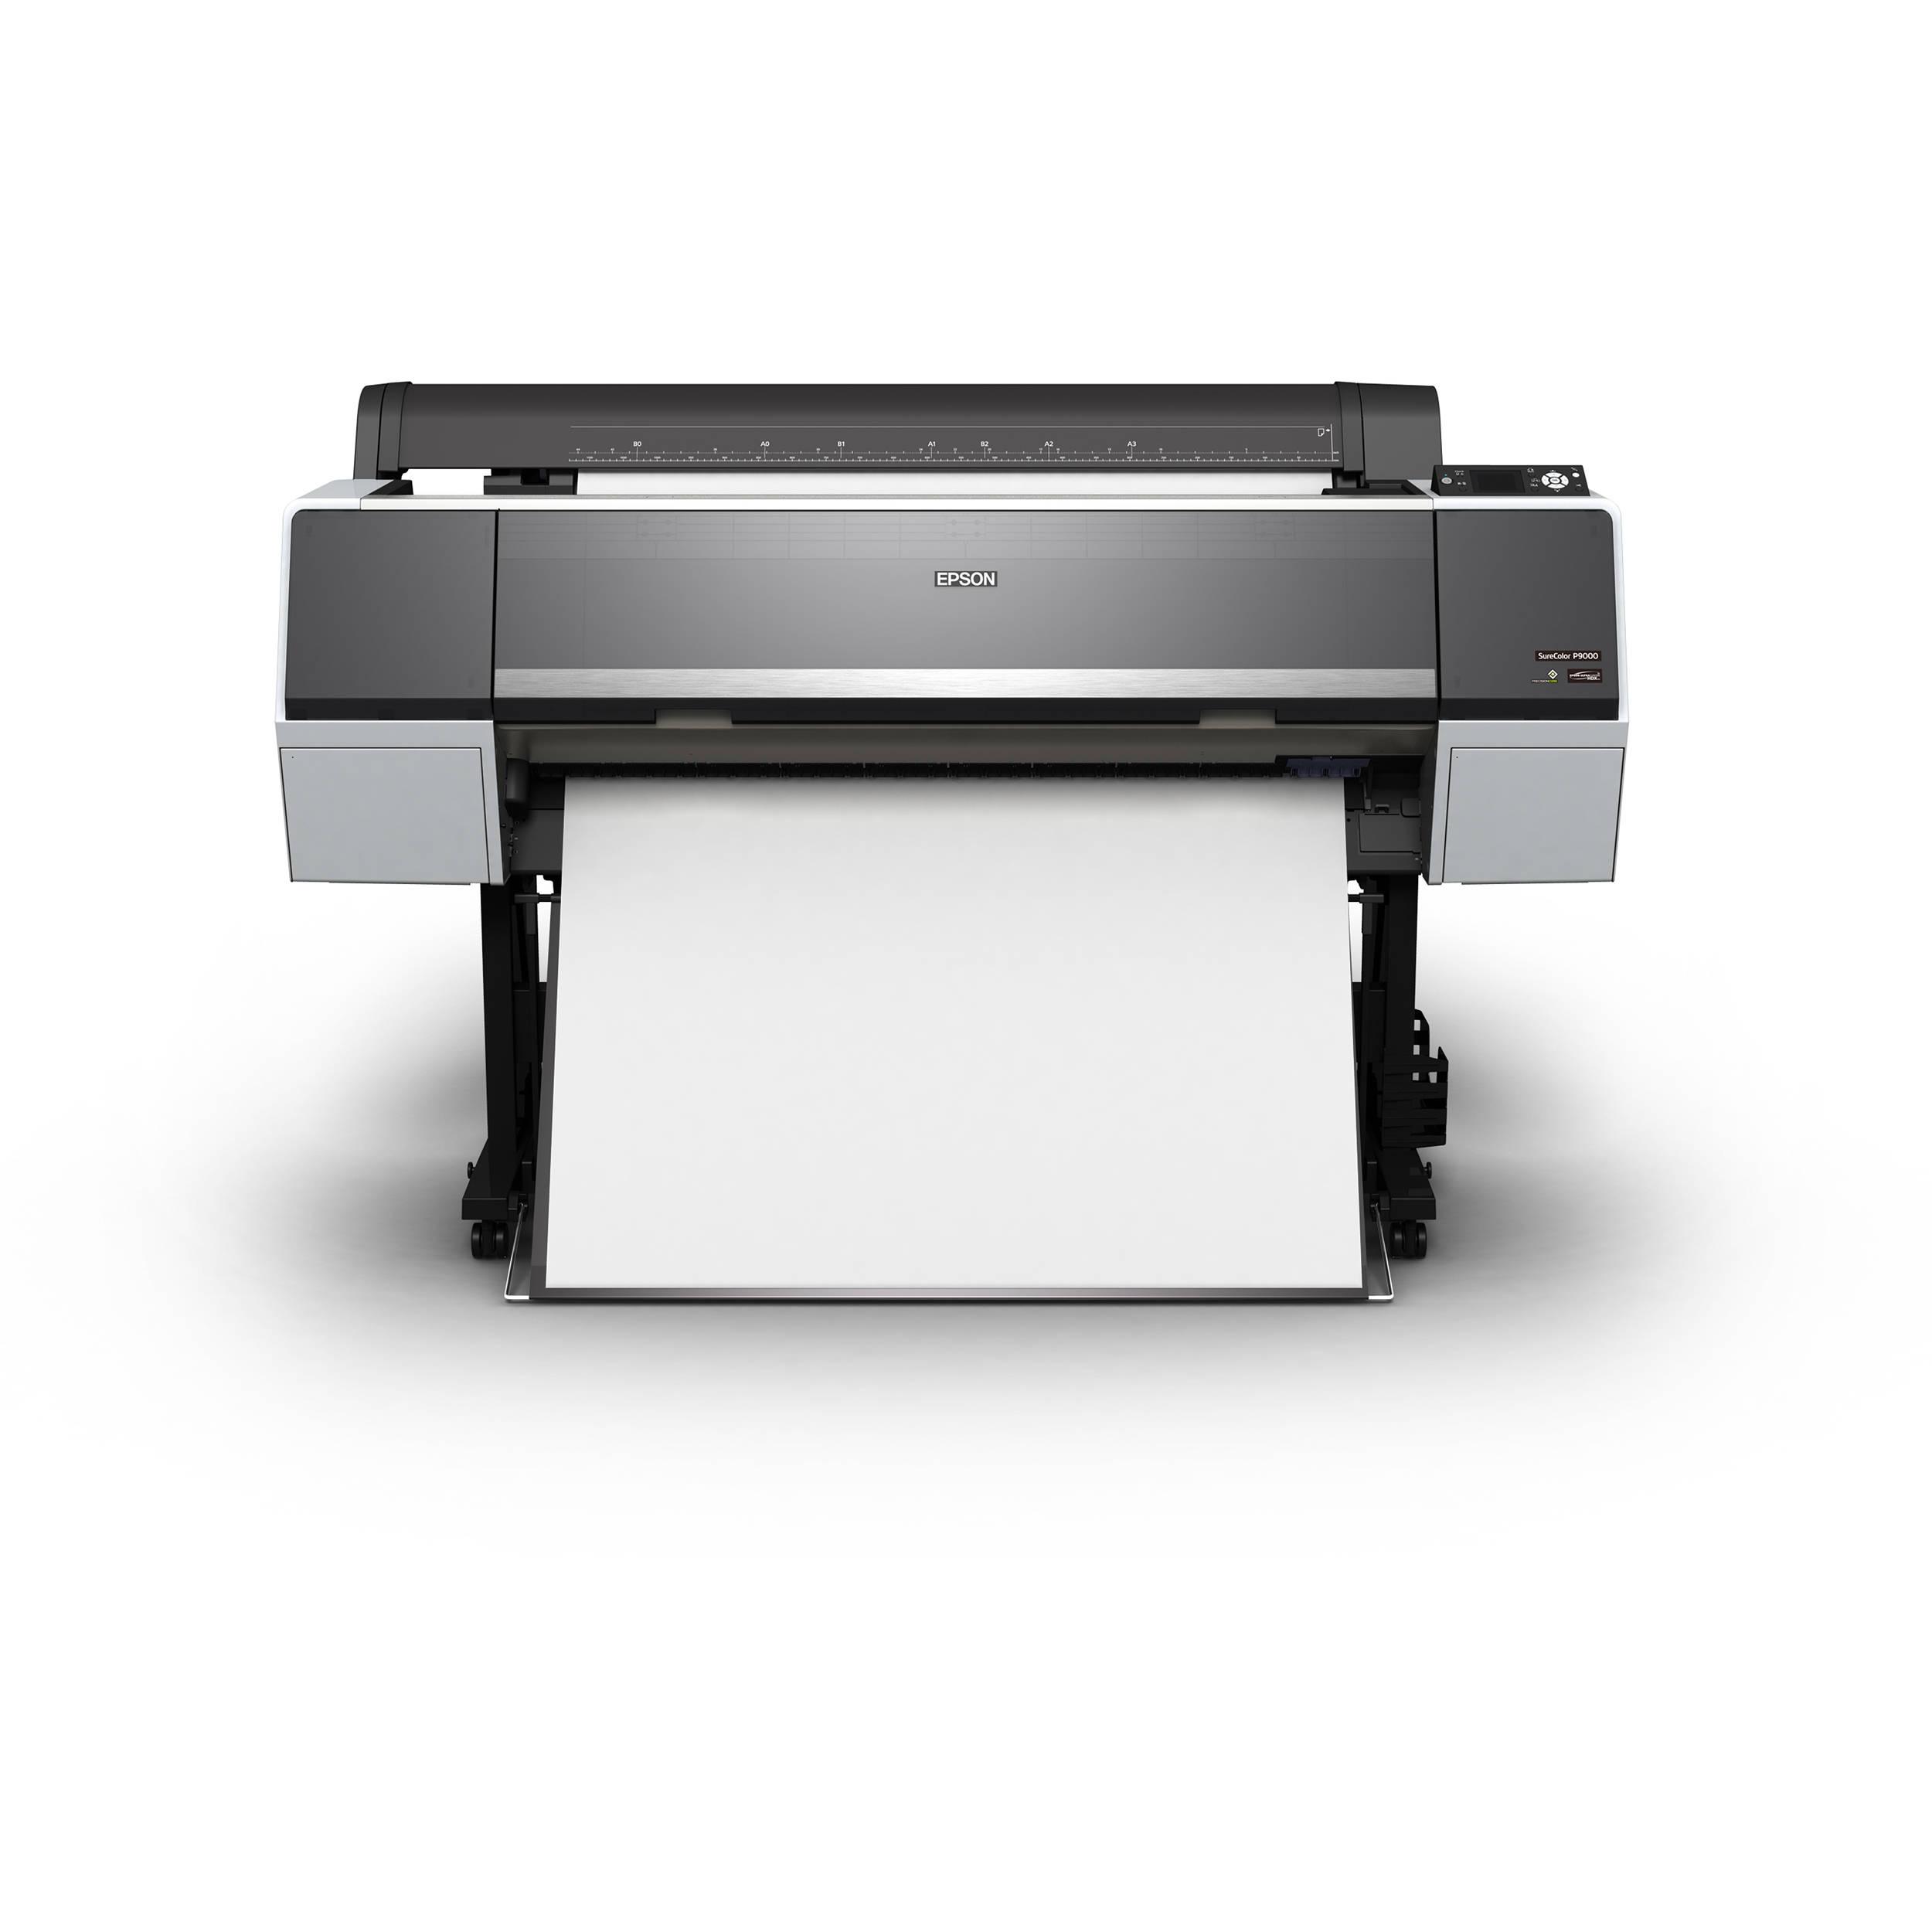 Epson SureColor P9000 Standard Edition 44 Large Format Inkjet Printer